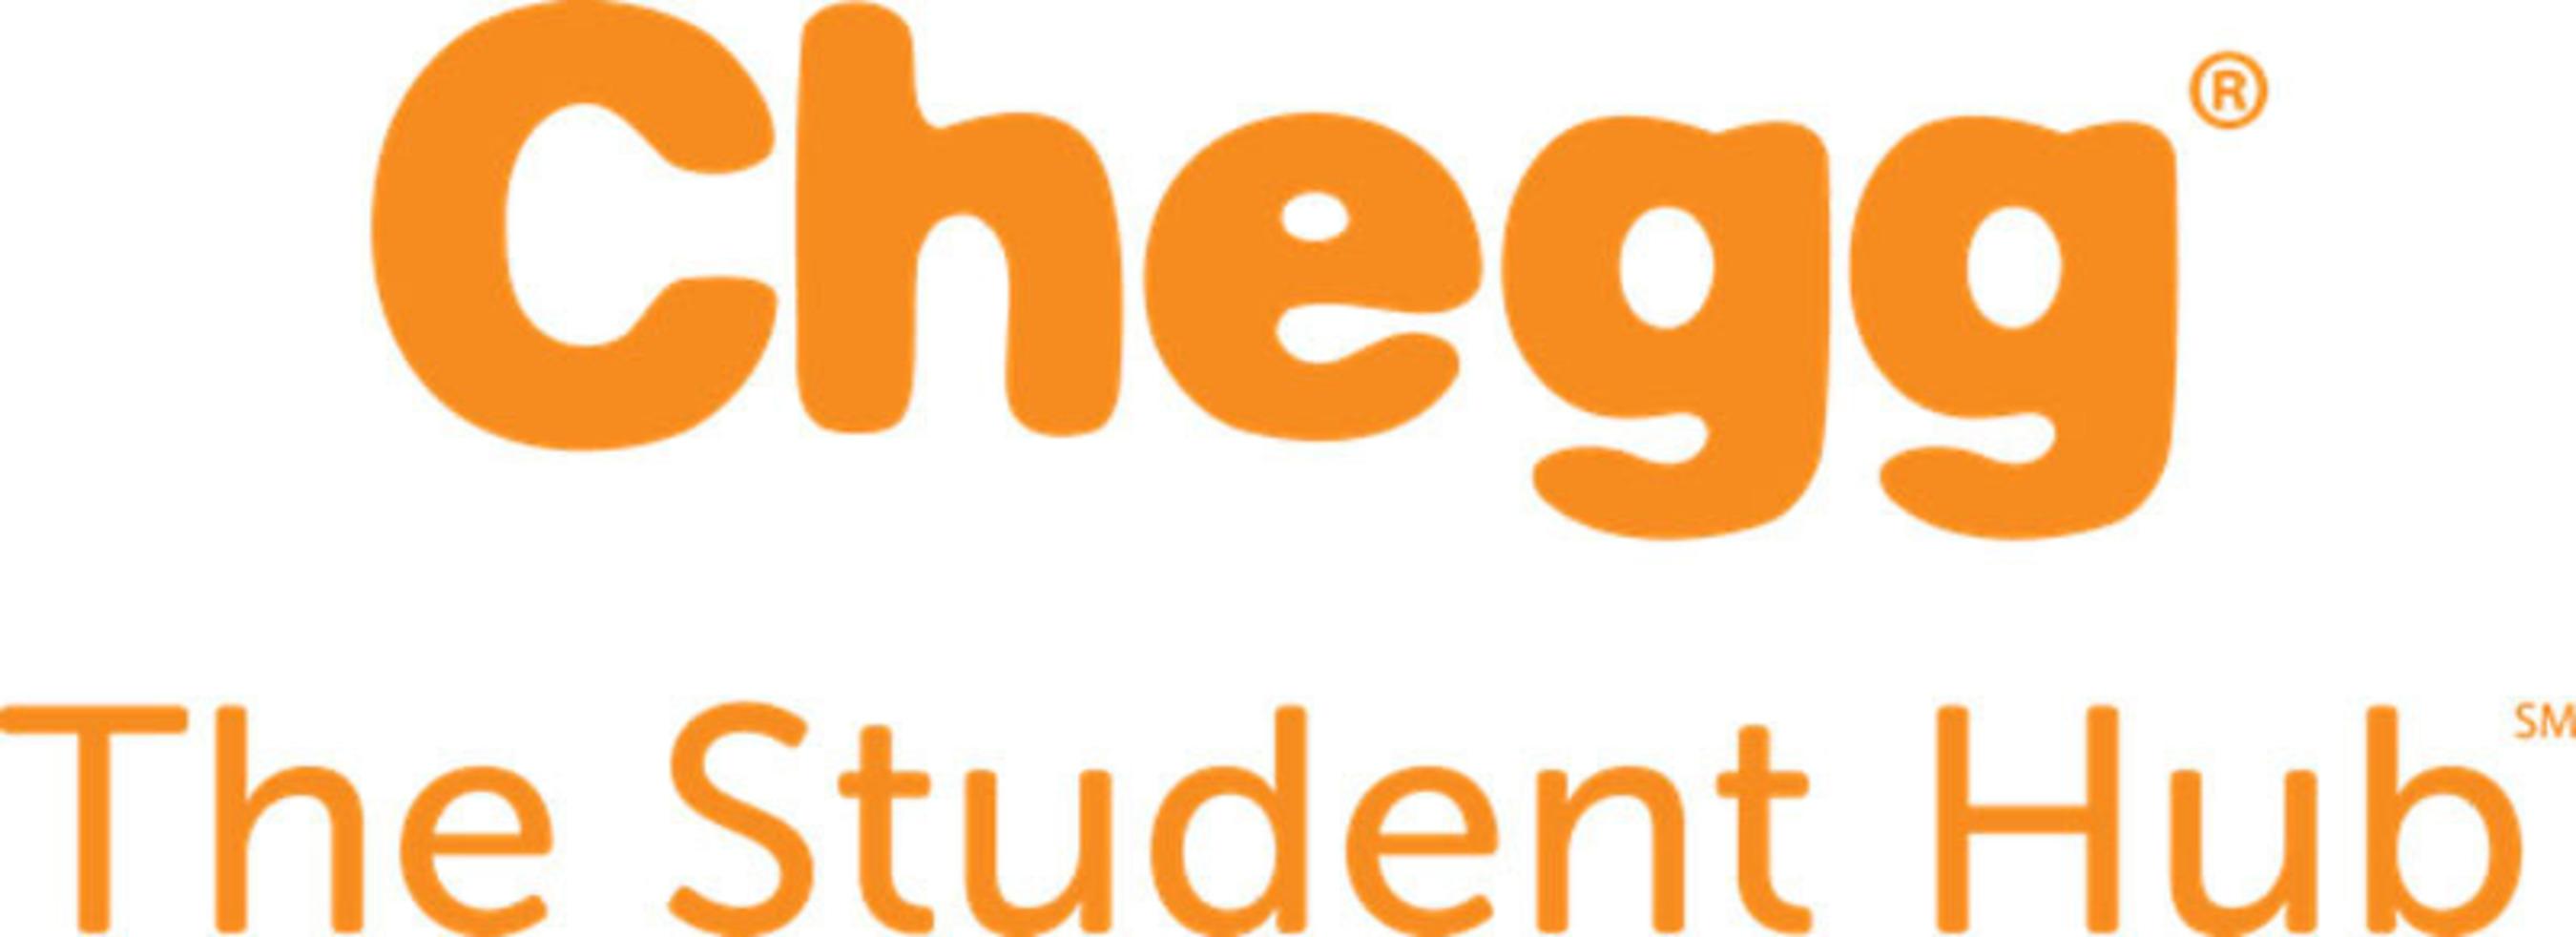 Chegg, The Student Hub.